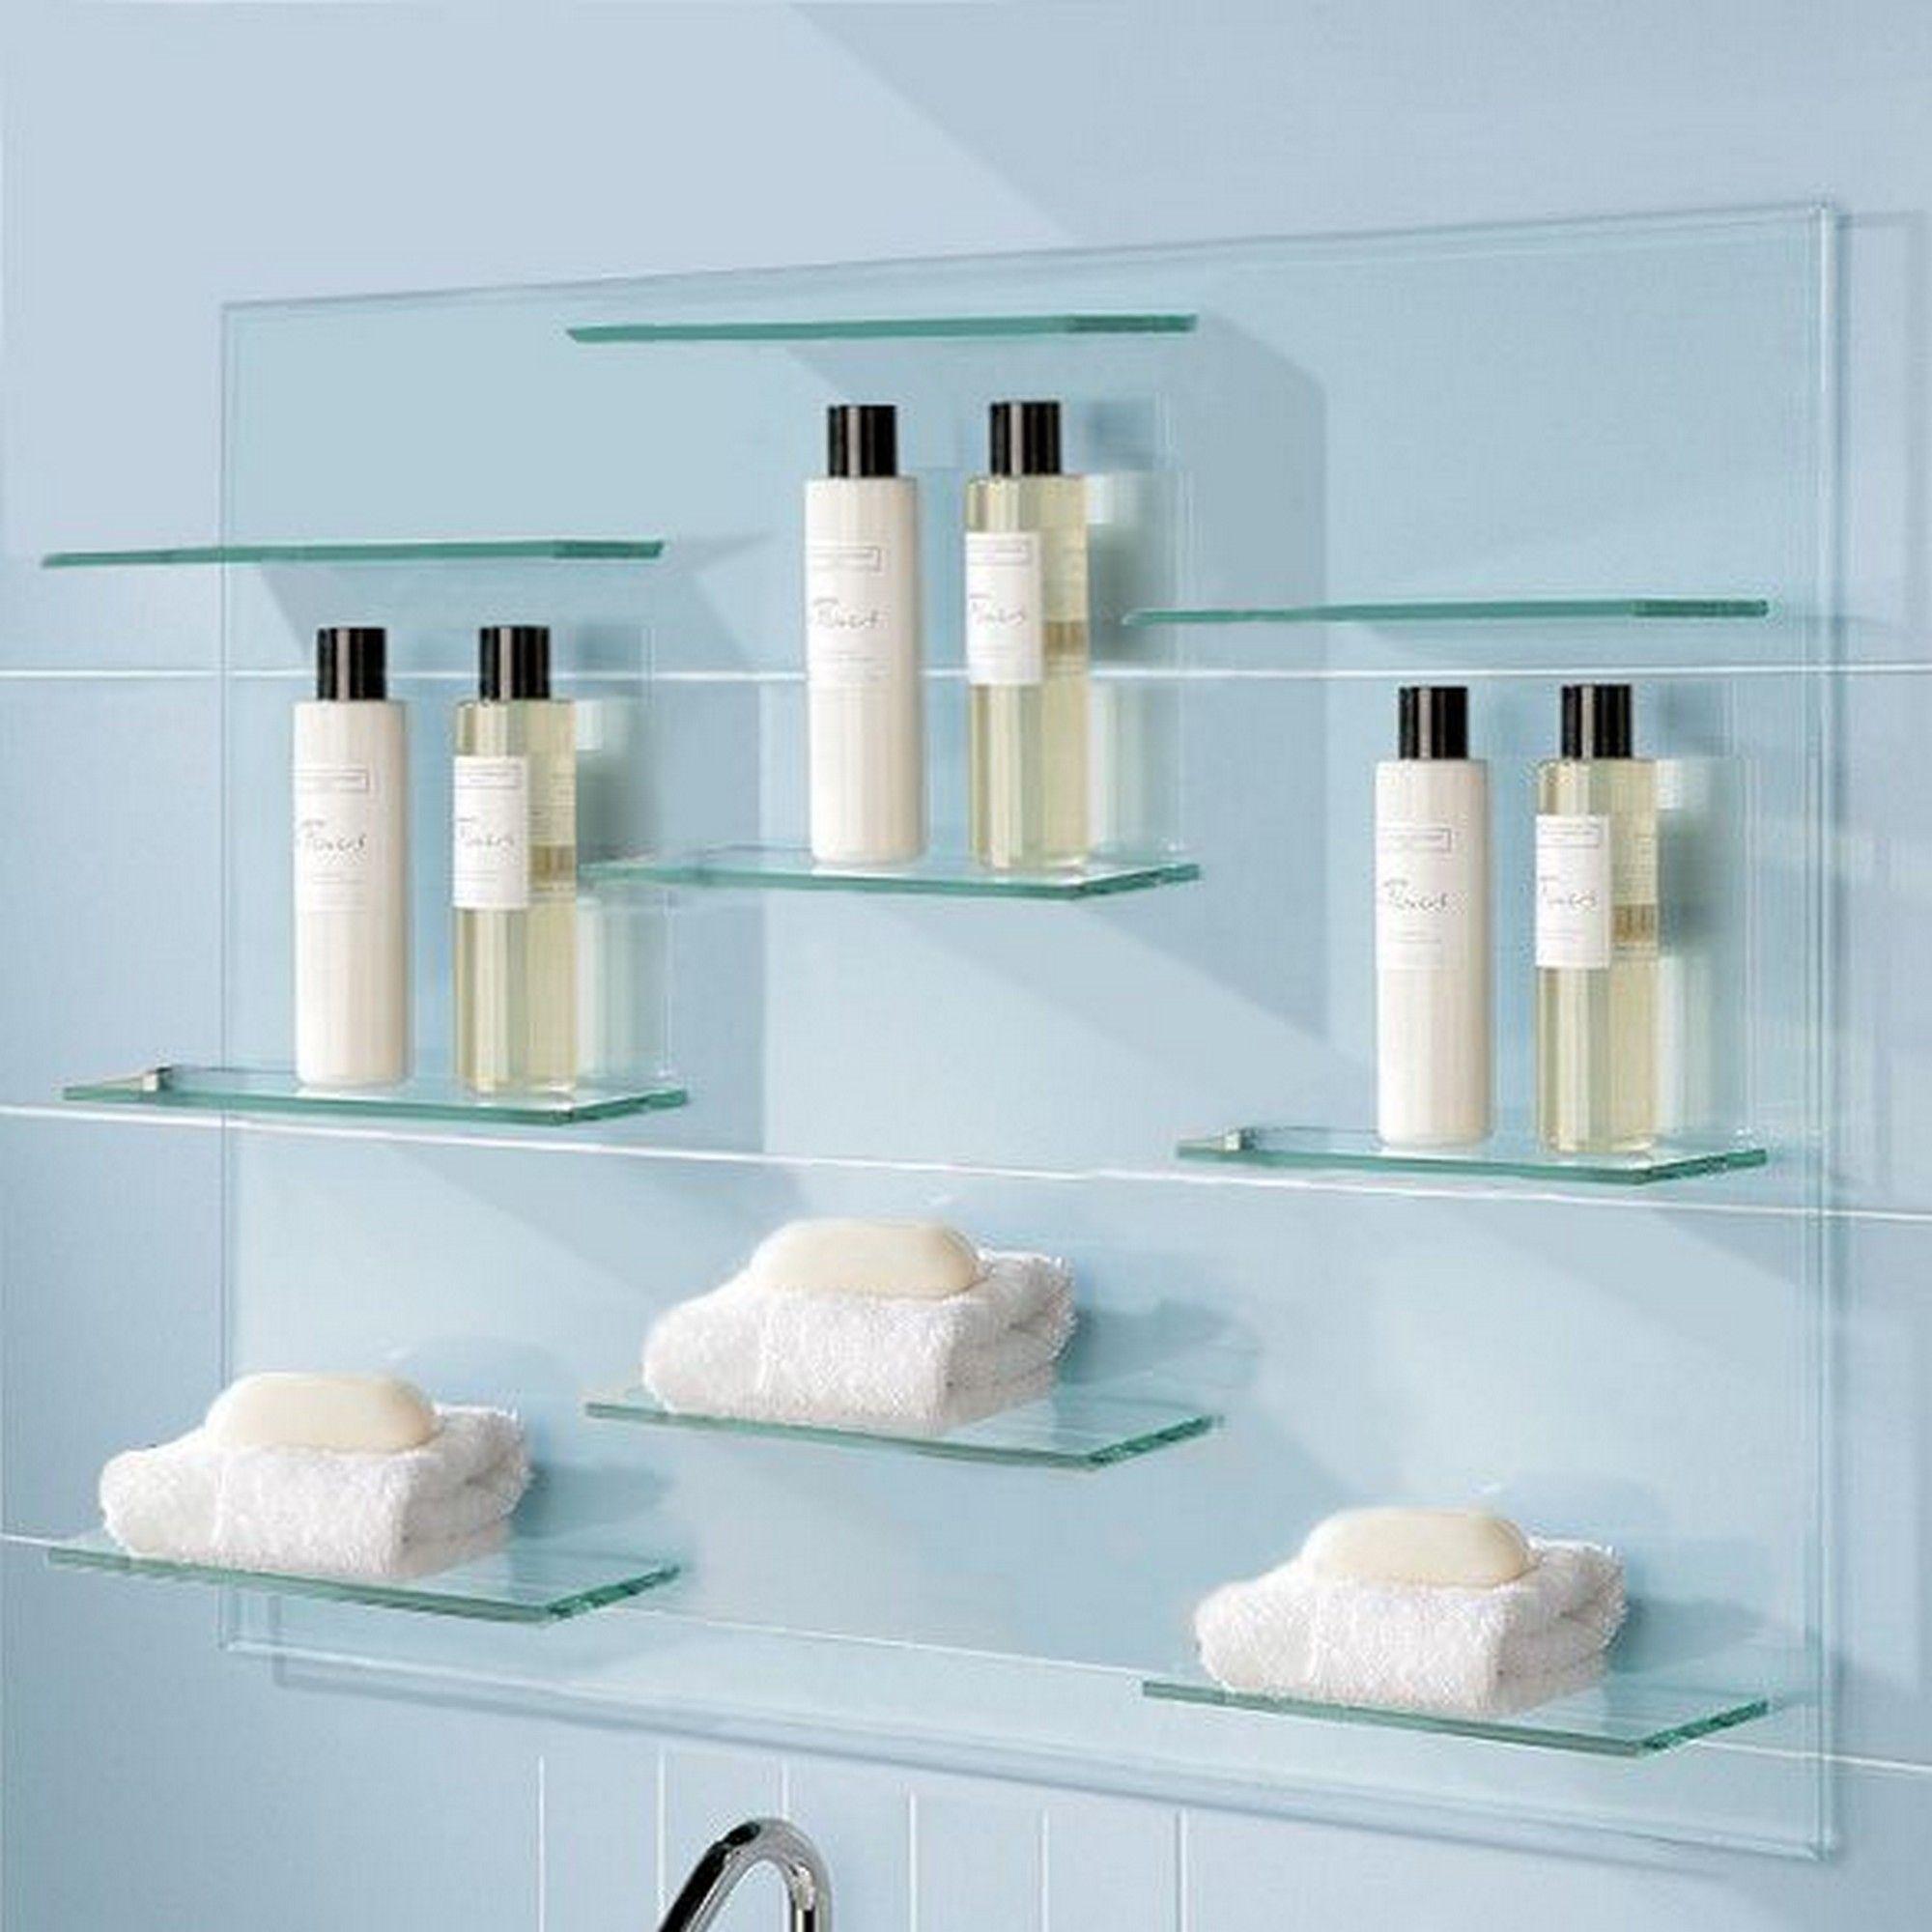 DIY floating glass bathroom shelves - Google Search | bathroom ...